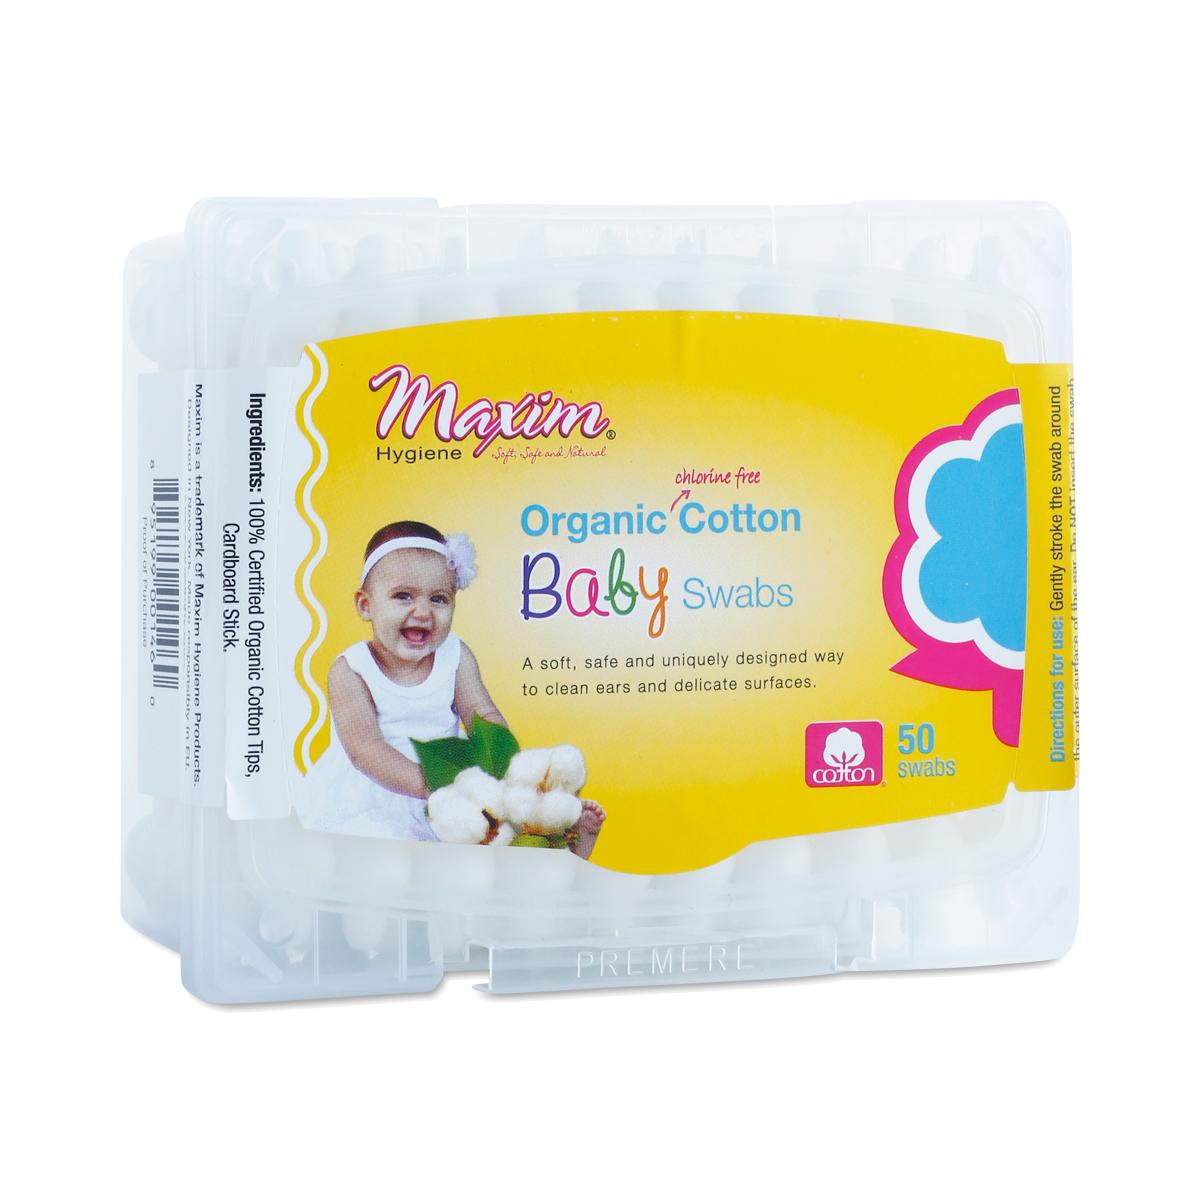 Maxim Hygiene - Organic Chlorine Free Cotton Cleansing Pleats - 32 Count (pack of 4) Anti-Aging Peeling Gel (4oz)